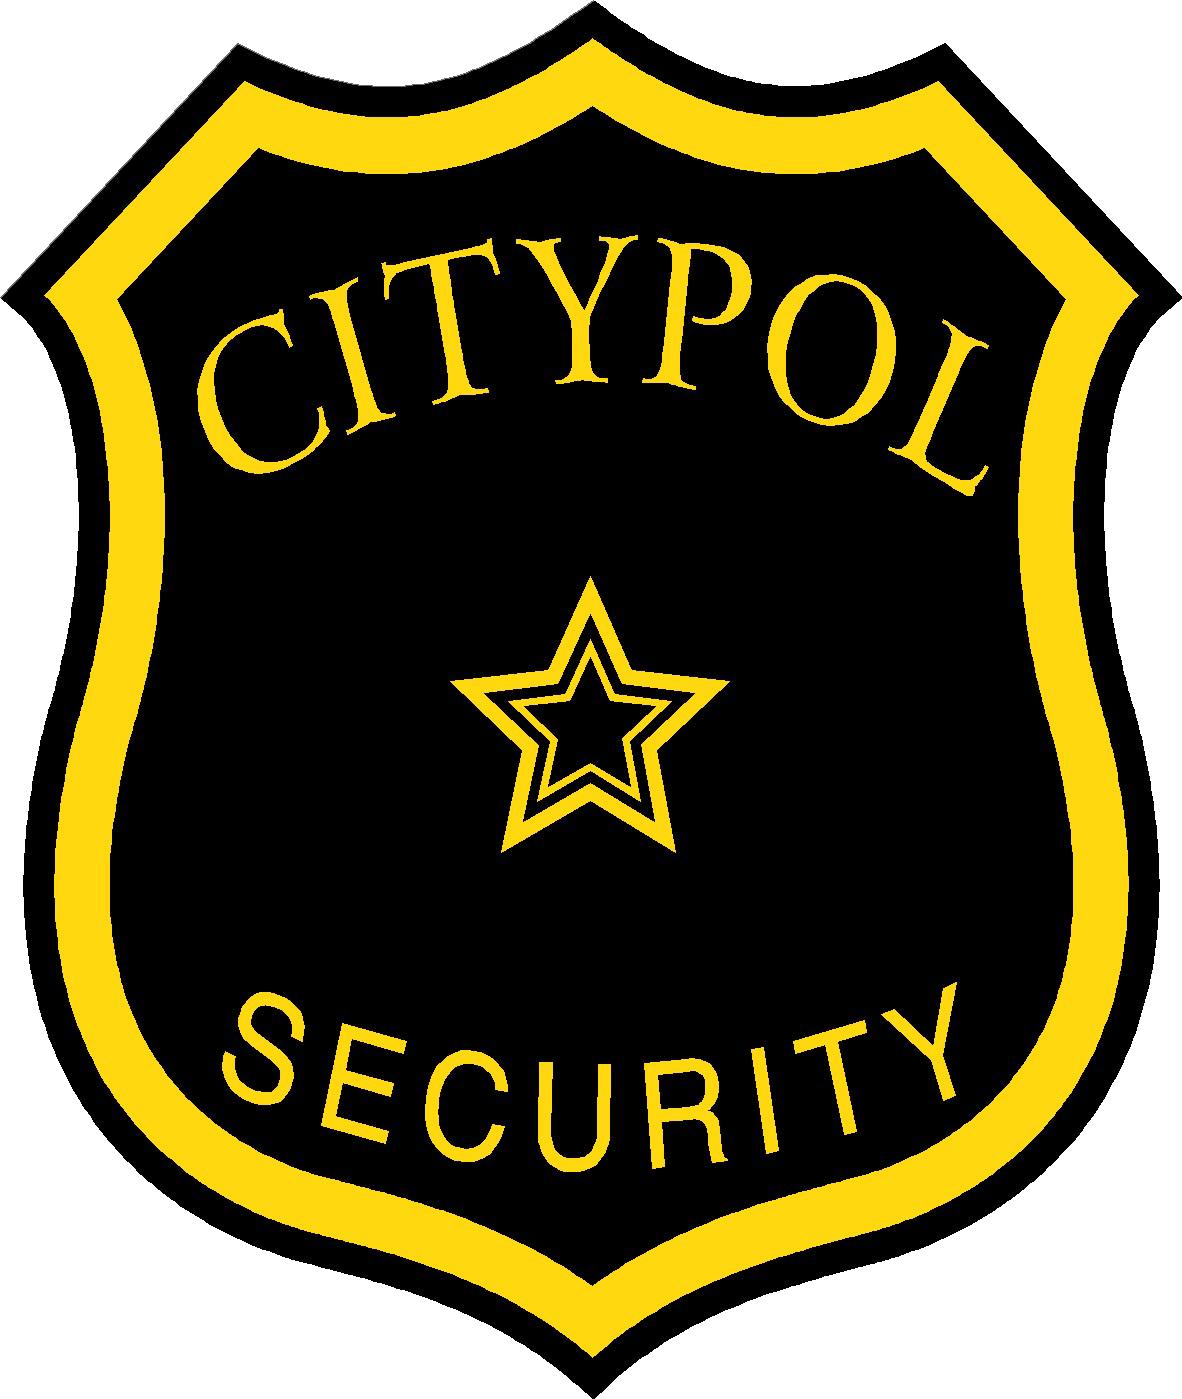 Citypol-Bielefeld-Detektei & Security